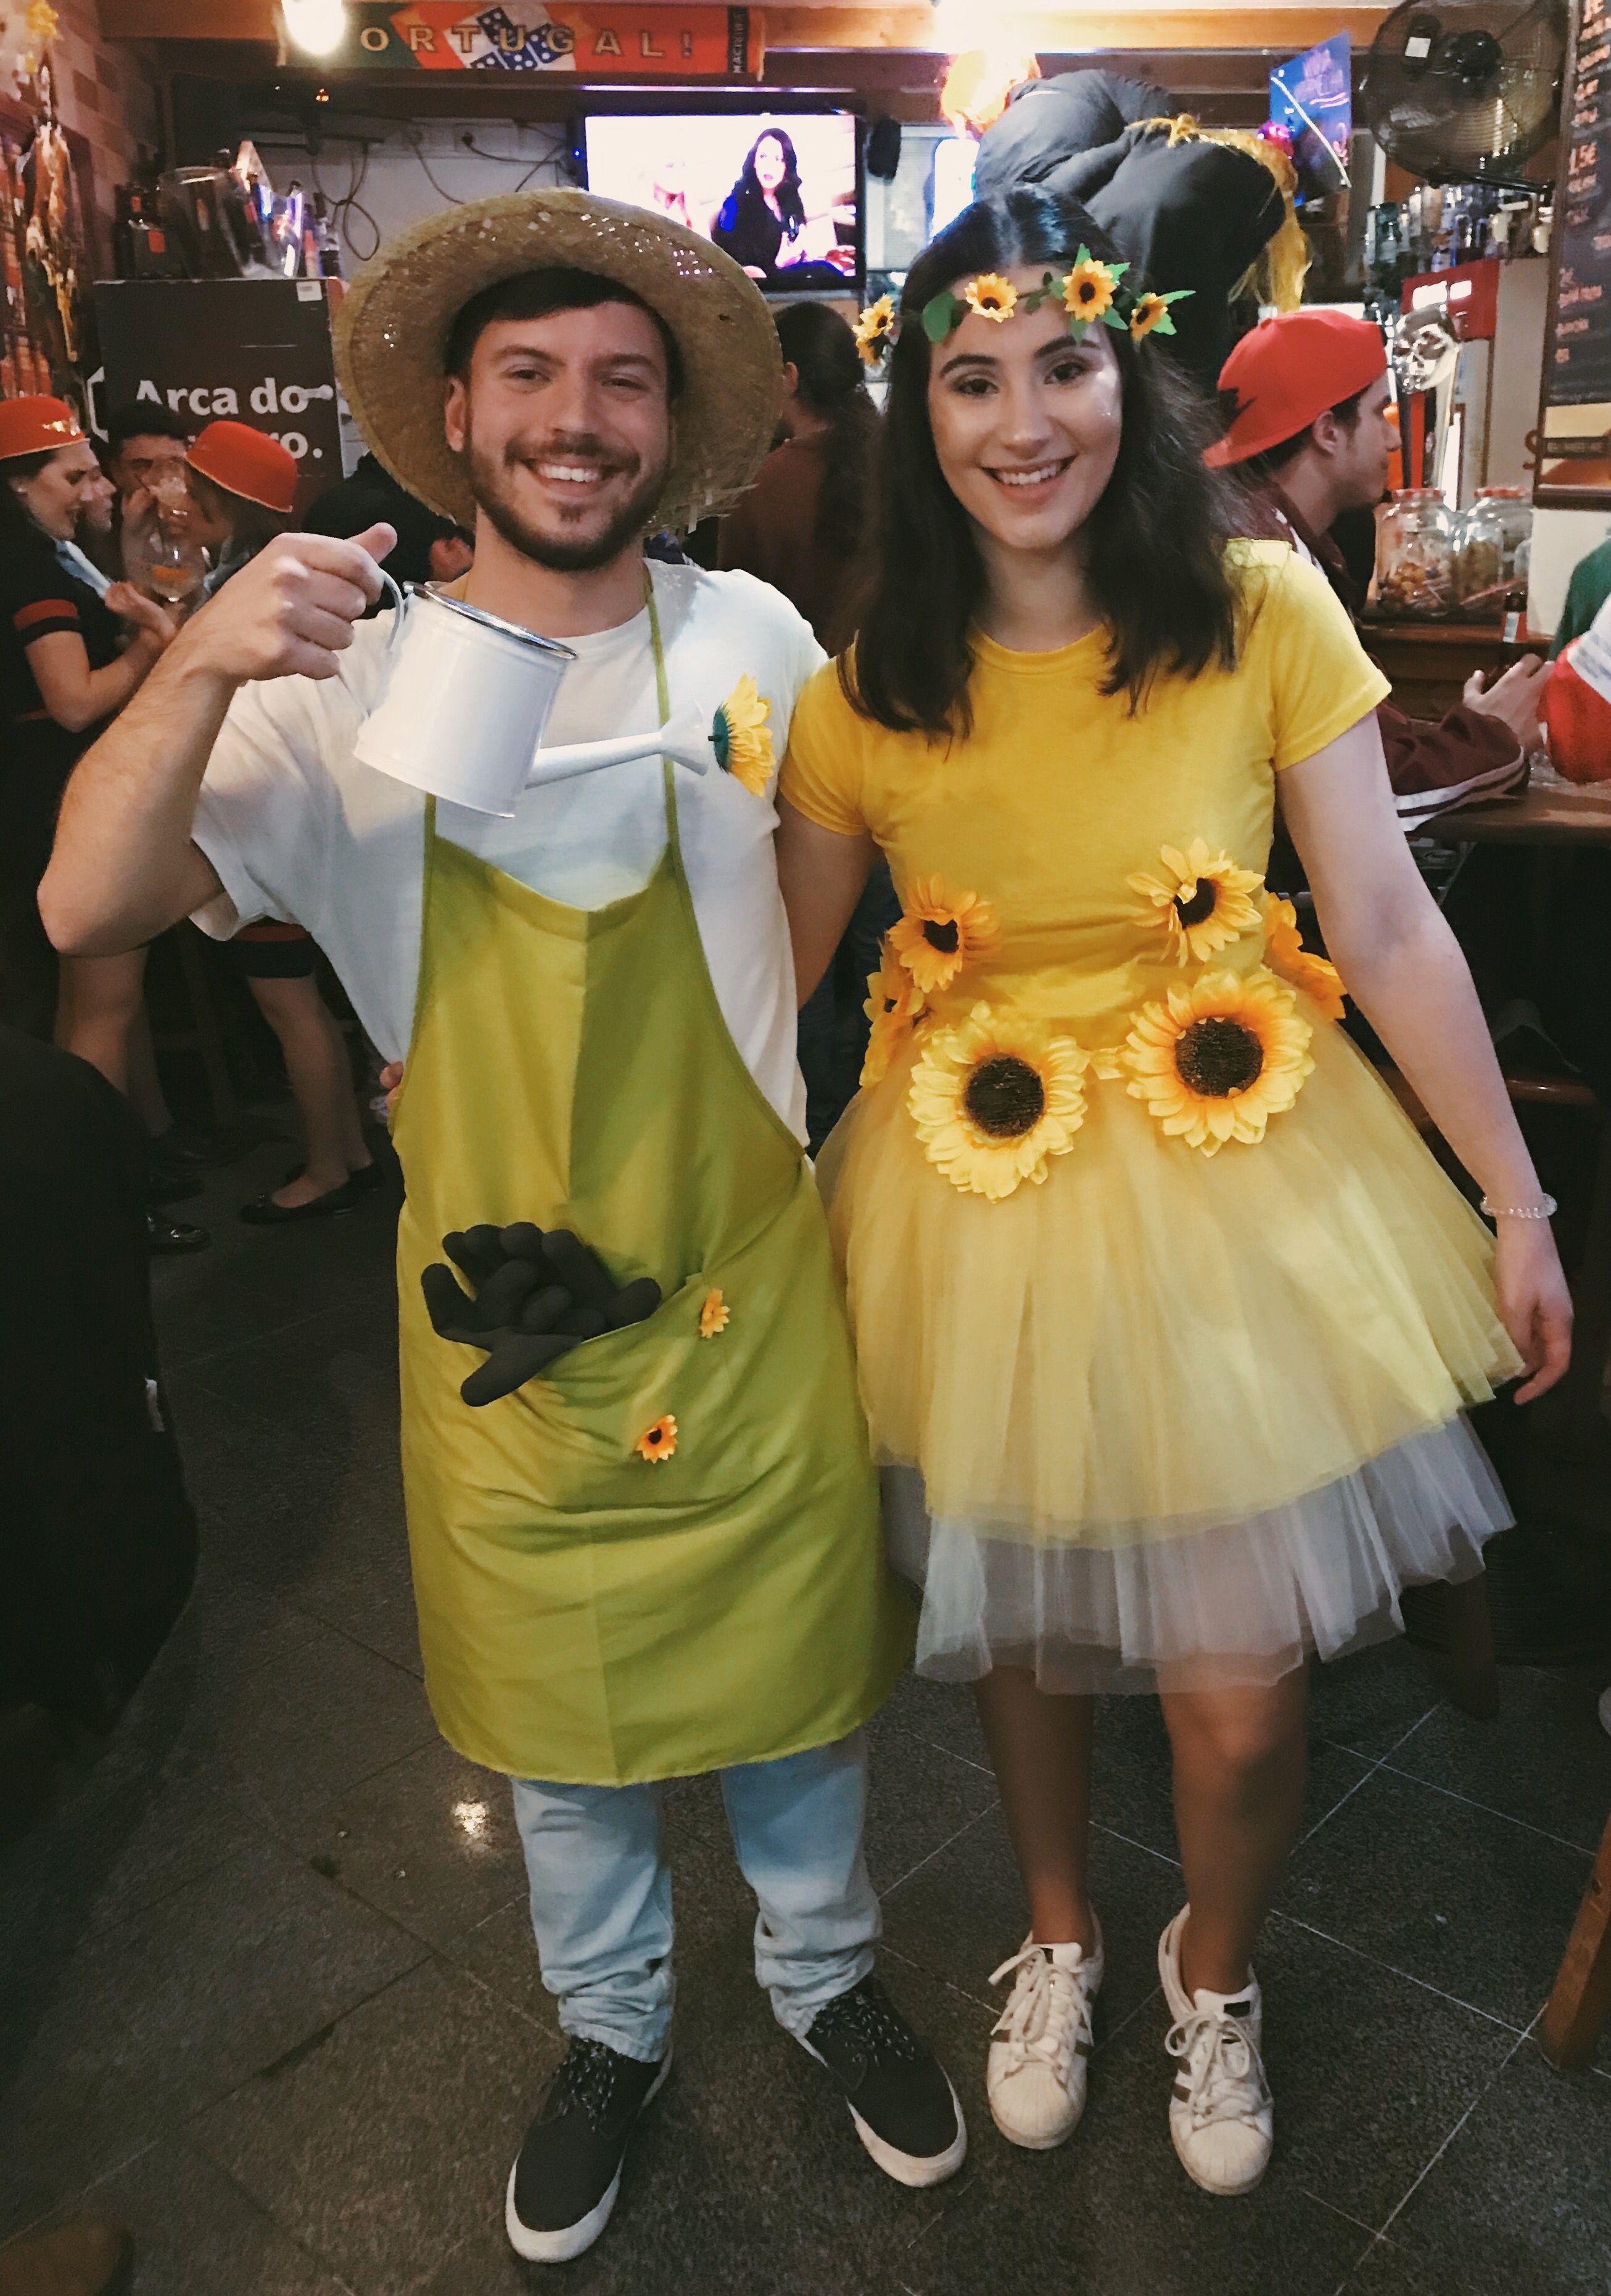 I M Your Flower Flower Costume Halloween Couple Halloween Costumes Haloween Costumes